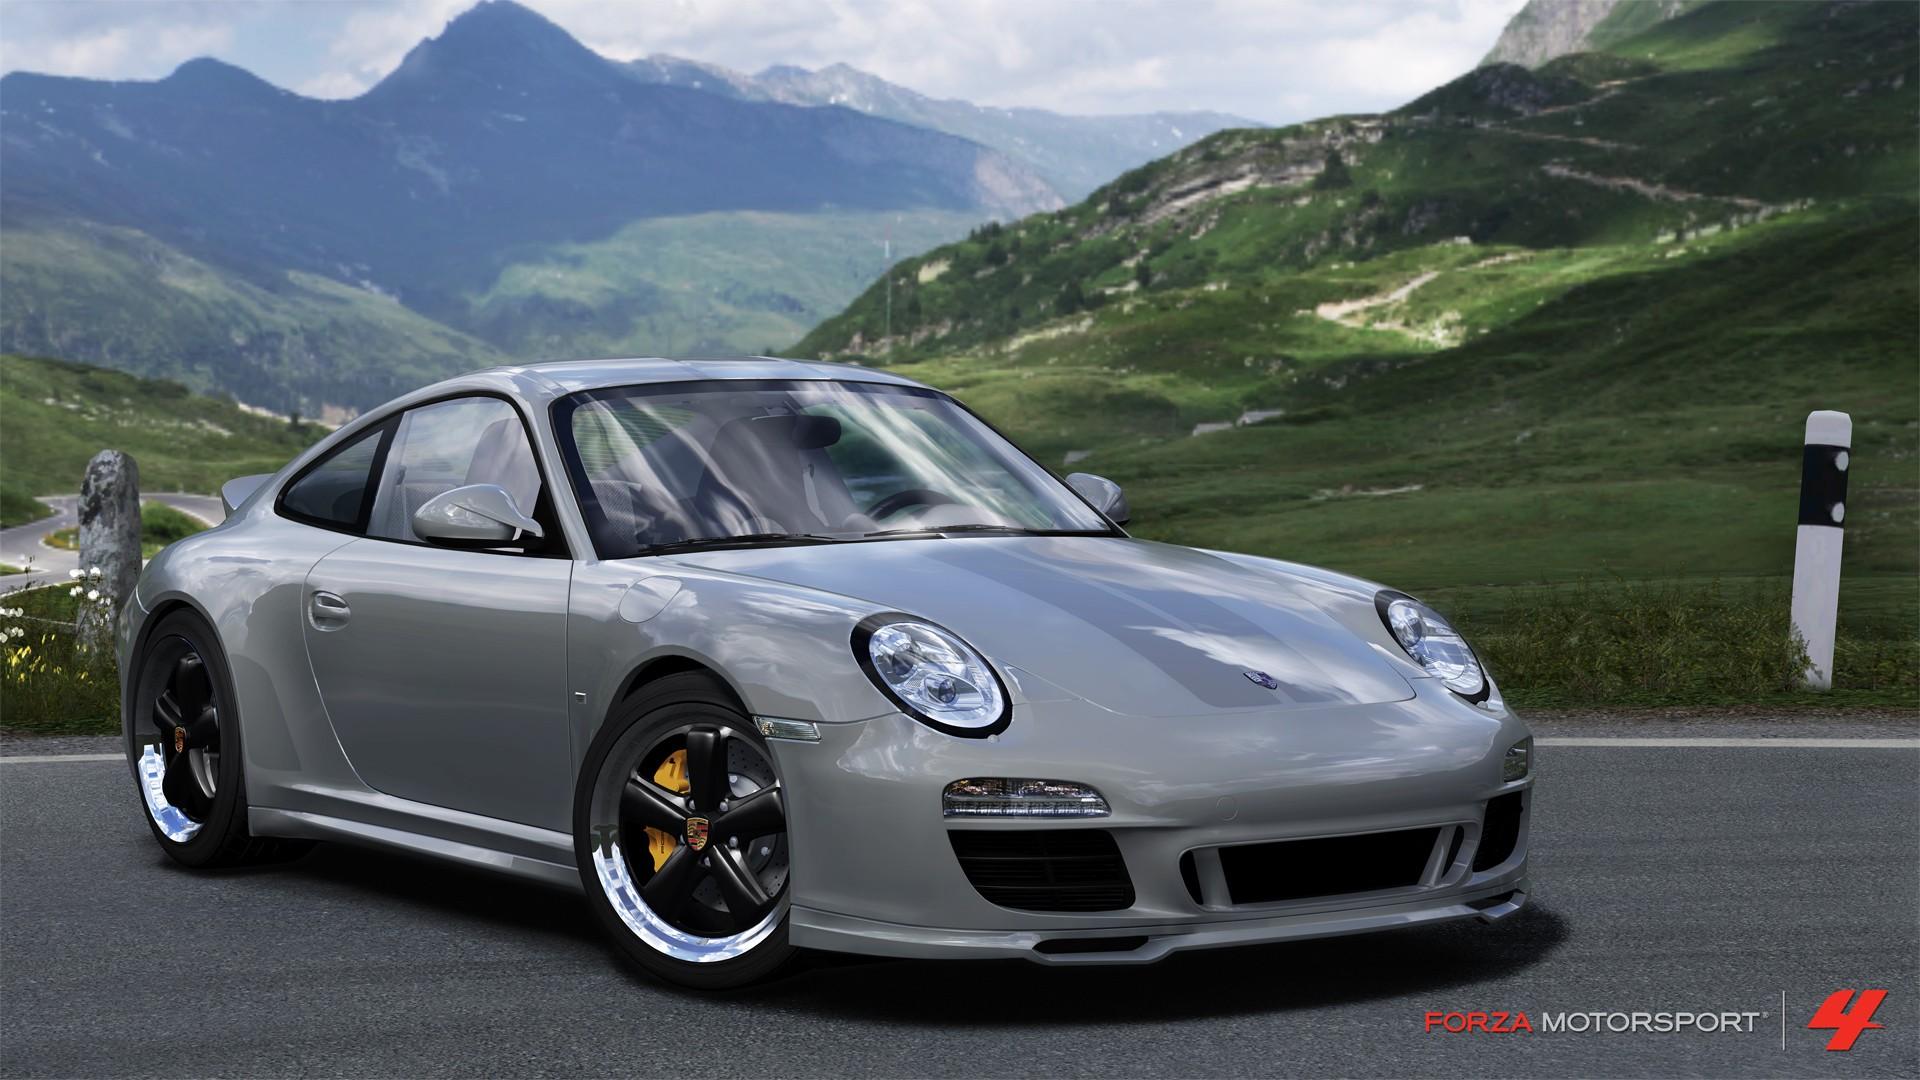 cars Xbox 360 Porsche 911 Forza Motorsport 4 wallpaper background 1920x1080